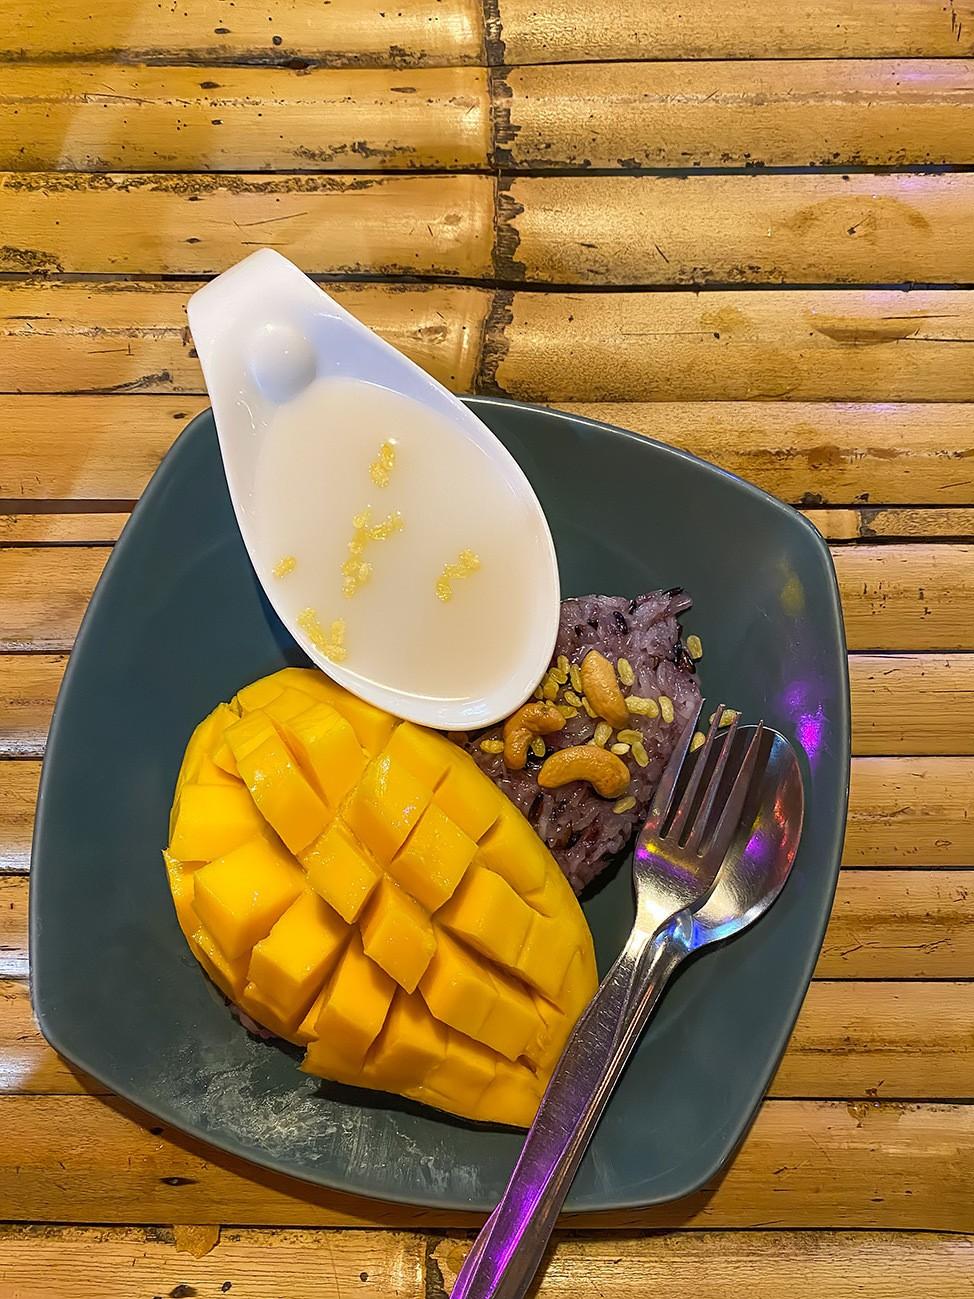 Good Time Restaurant, Srithanu, Koh Phangan